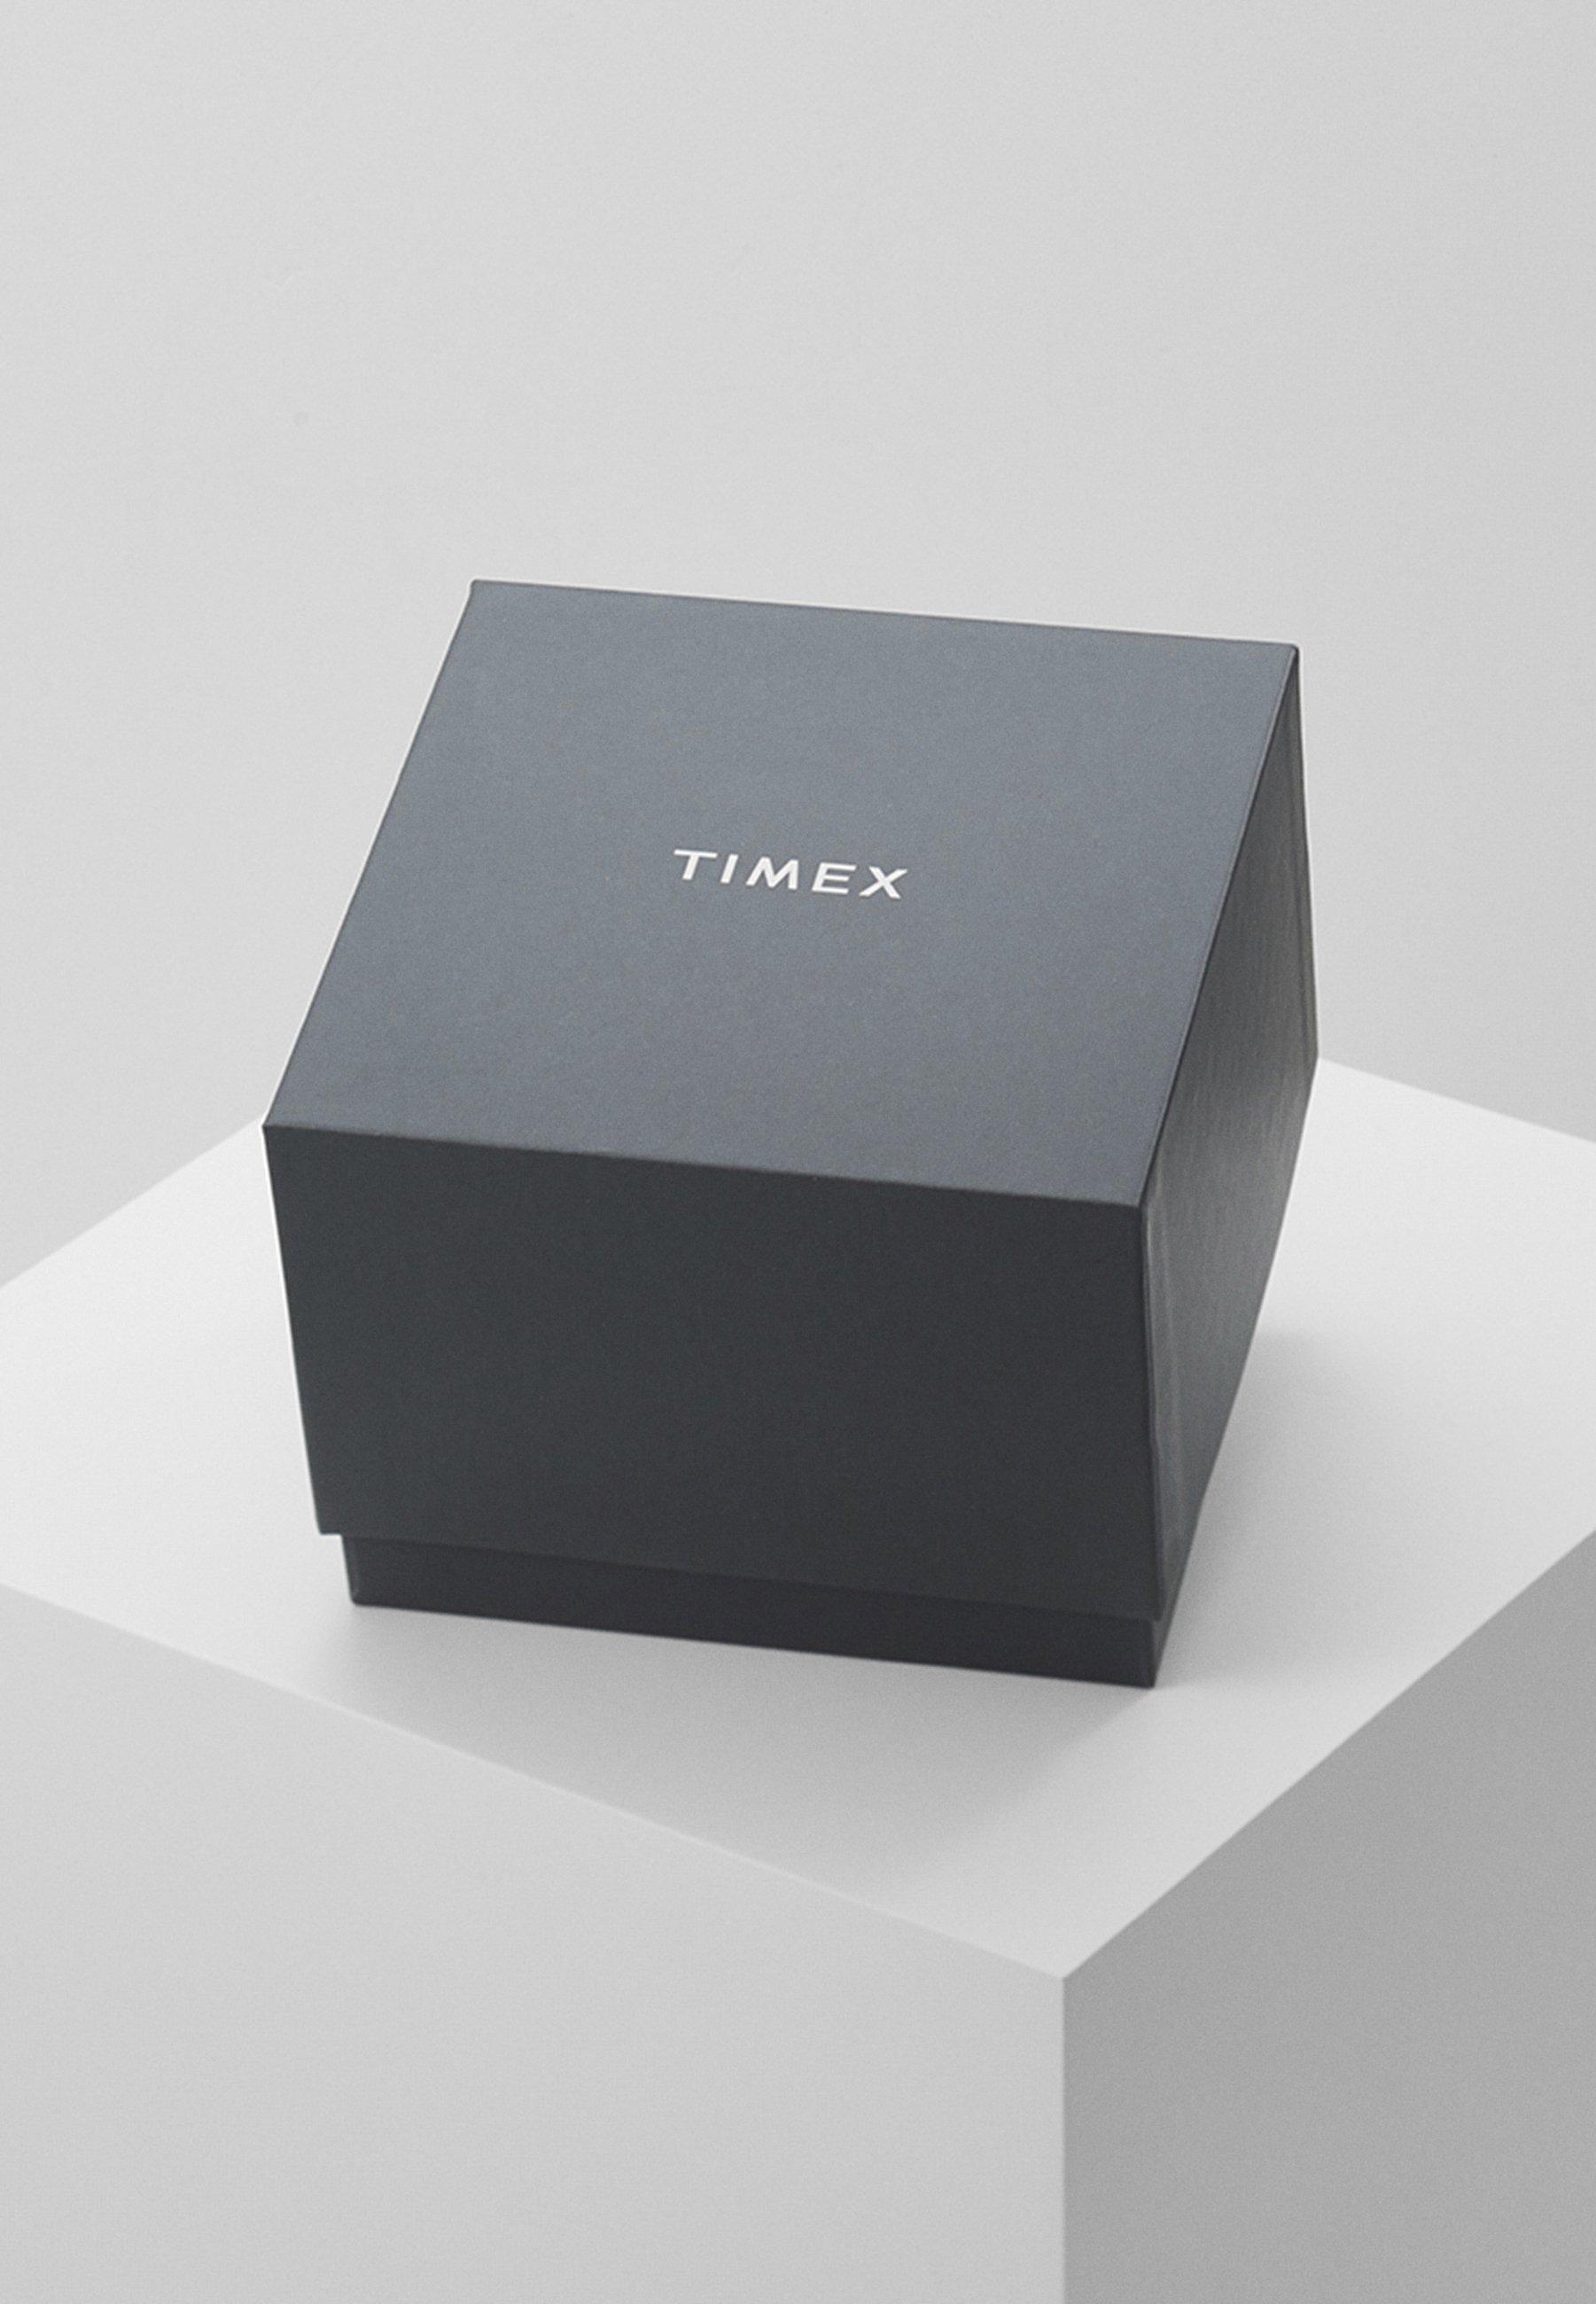 Timex WOMEN'S ORIGINAL - Klokke - rosegold-coloured/roségull-farget JcjnBN3Z7nkwZtW